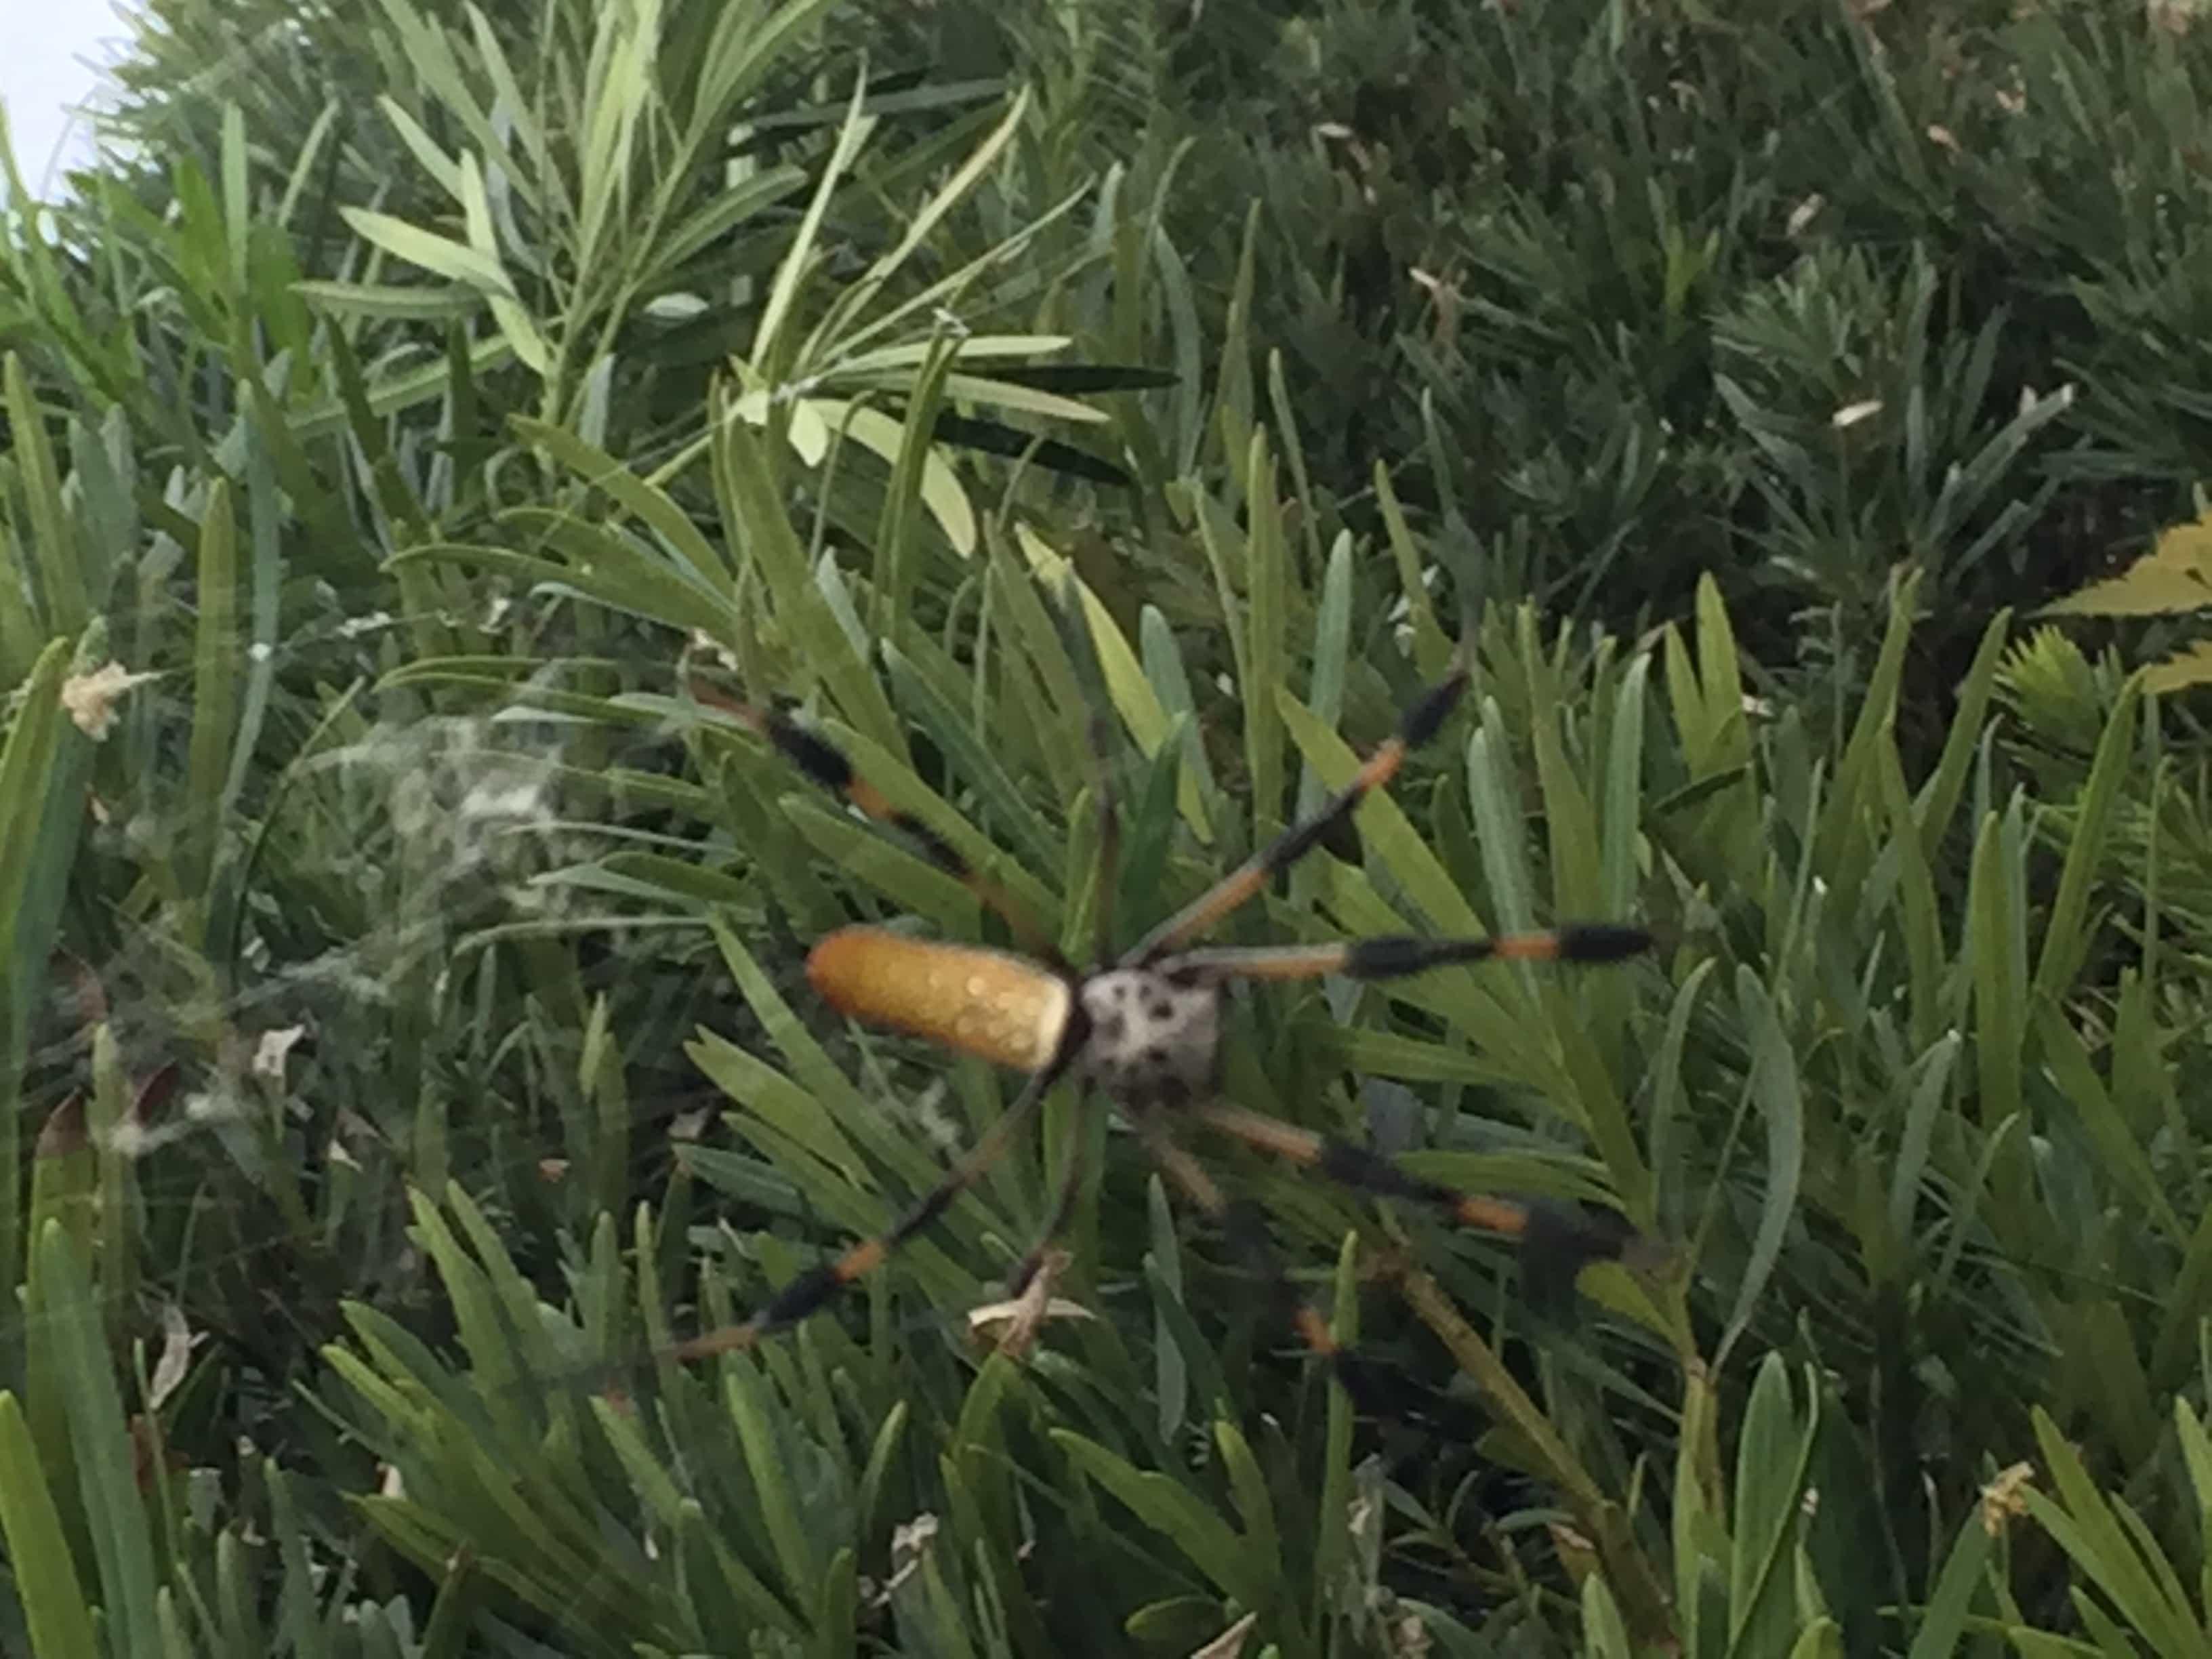 Picture of Trichonephila clavipes (Golden Silk Orb-weaver) - Female - Dorsal